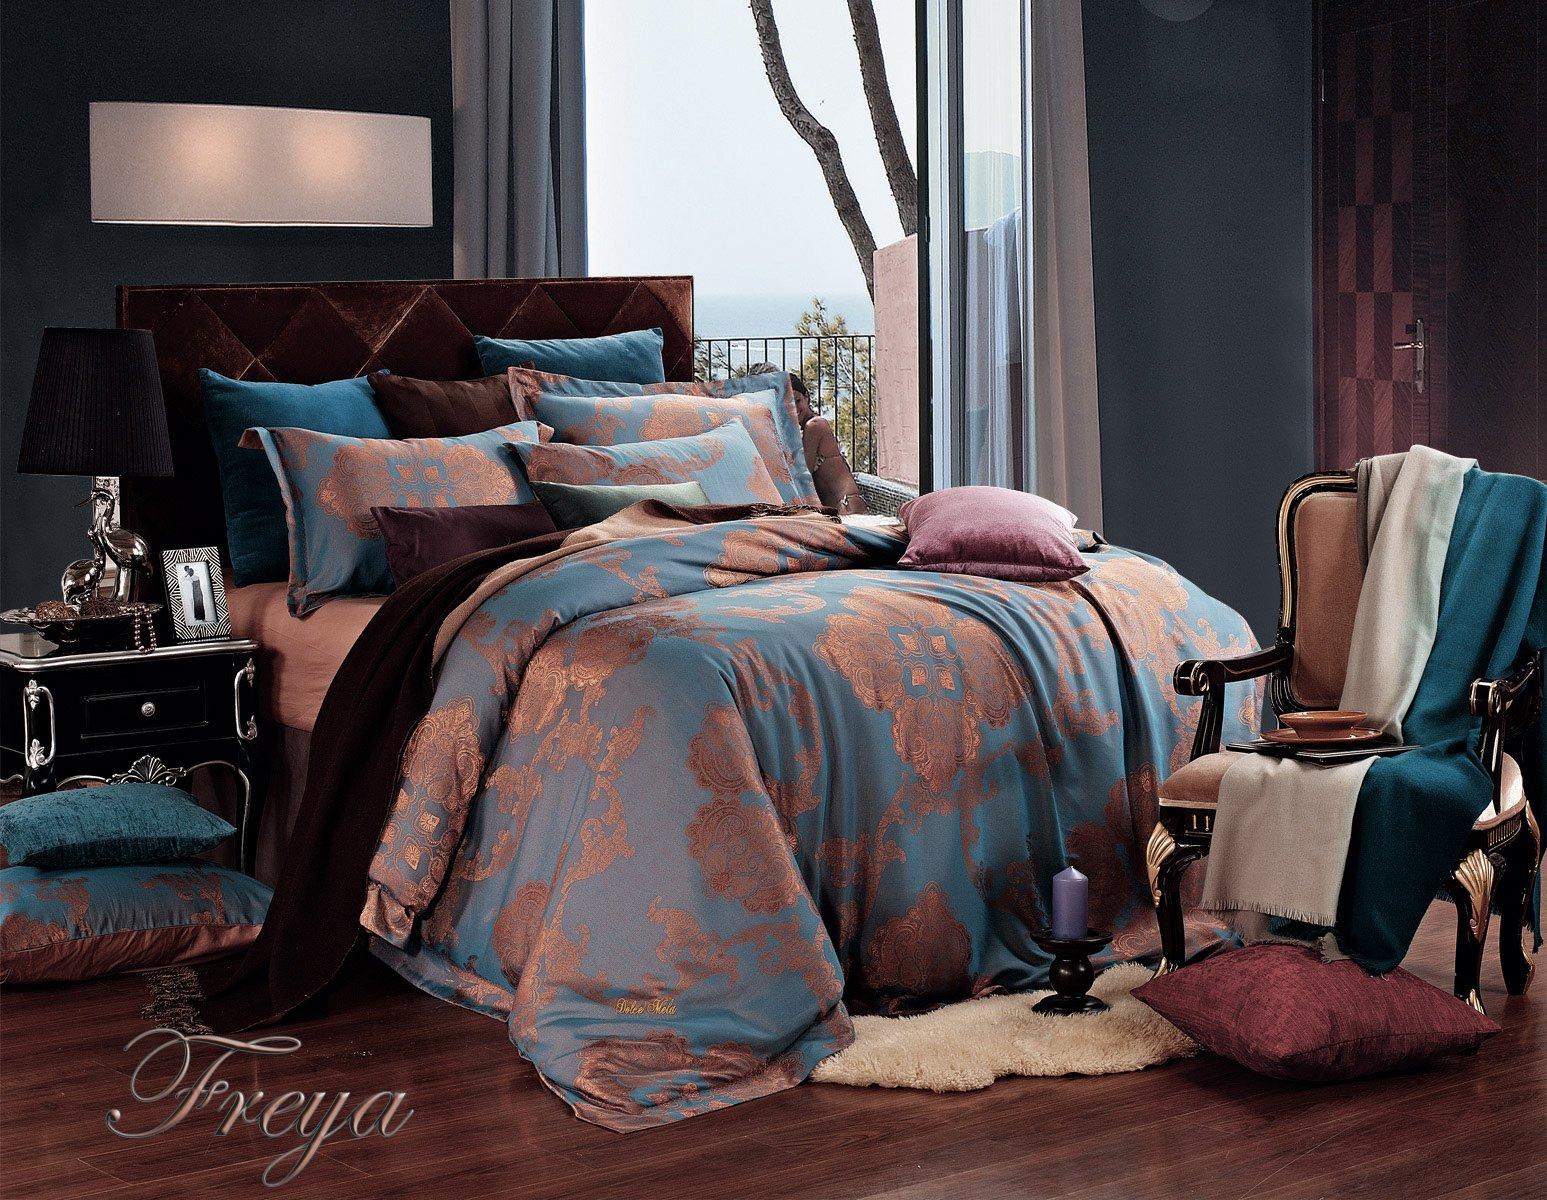 Freya by Dolce Mela 6PC King Size Duvet Cover Set Luxury